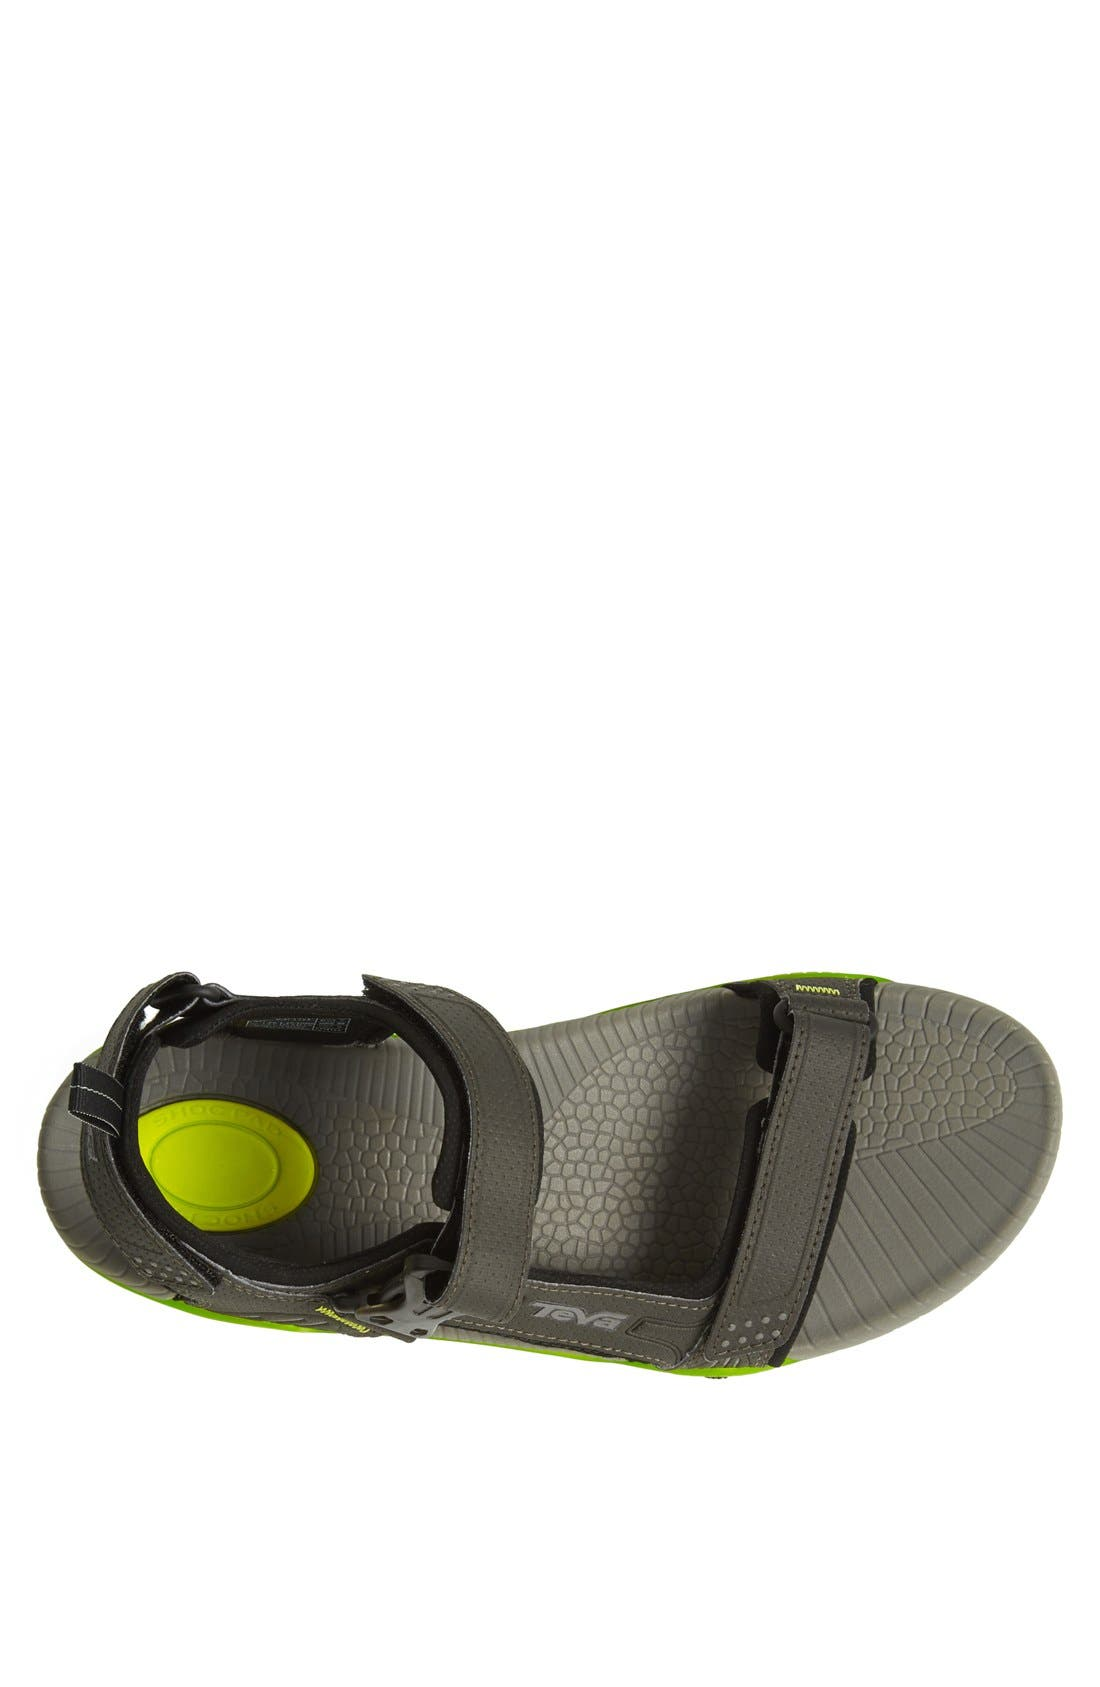 Alternate Image 3  - Teva 'Toachi 2' Sandal (Men)